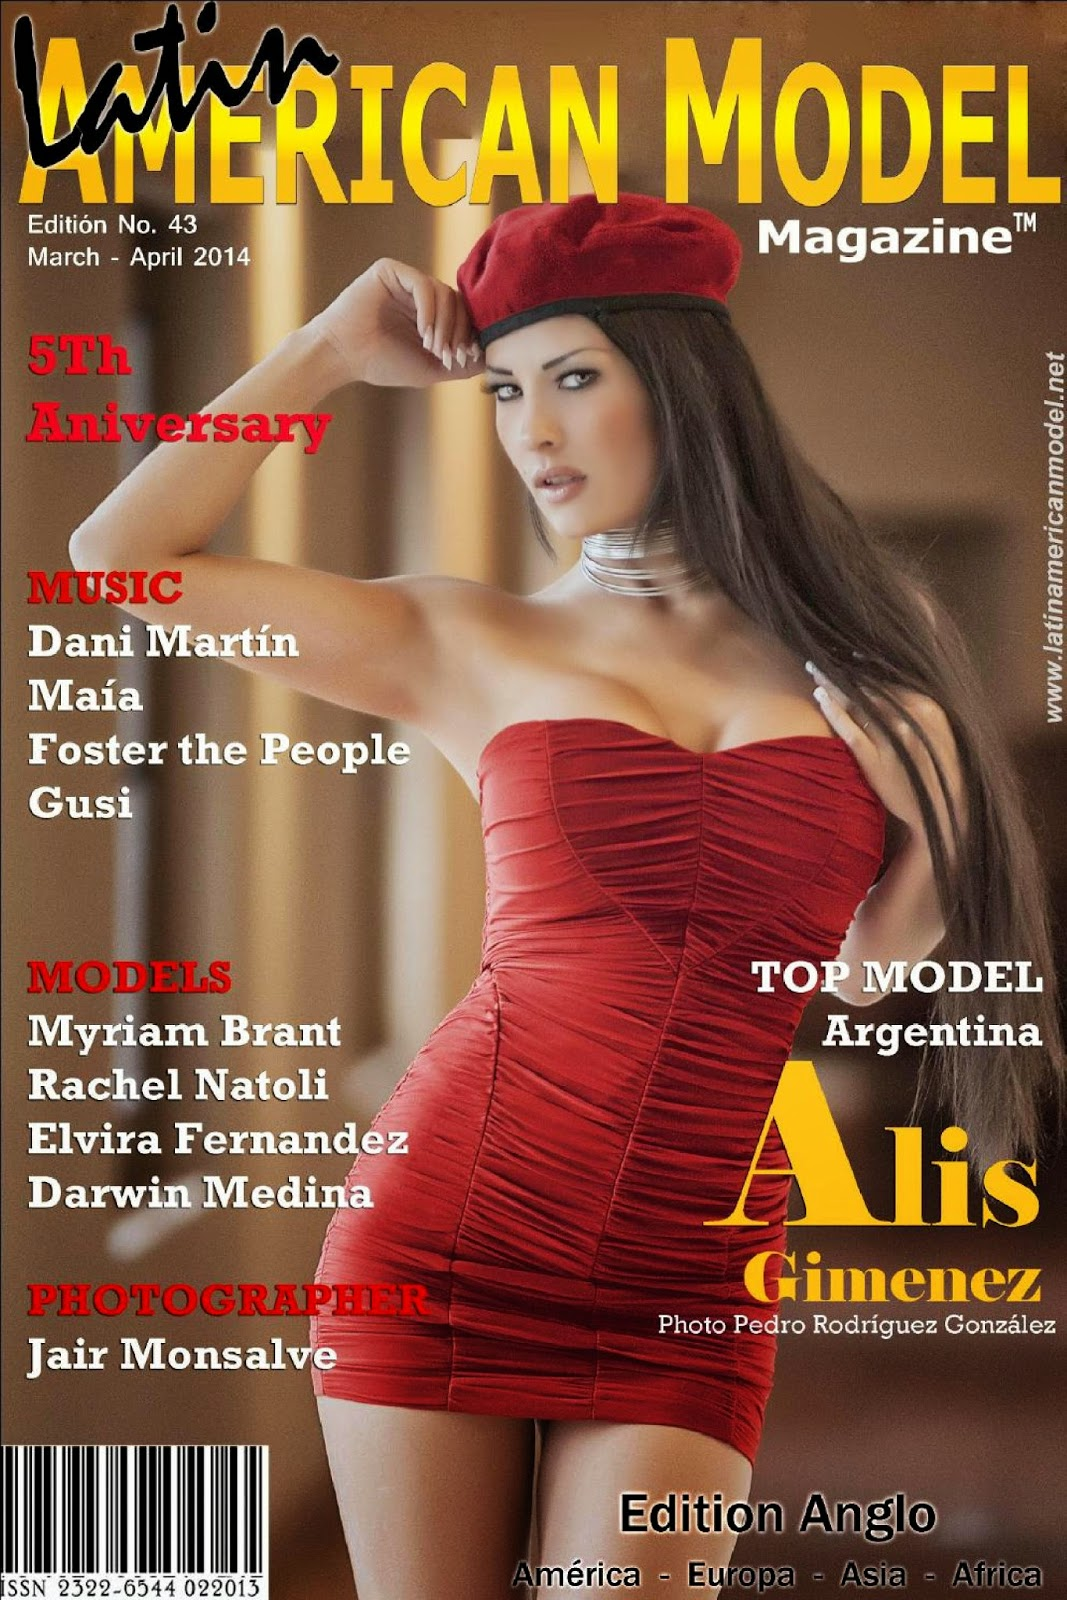 Hot Photos of Alis Gimenez.